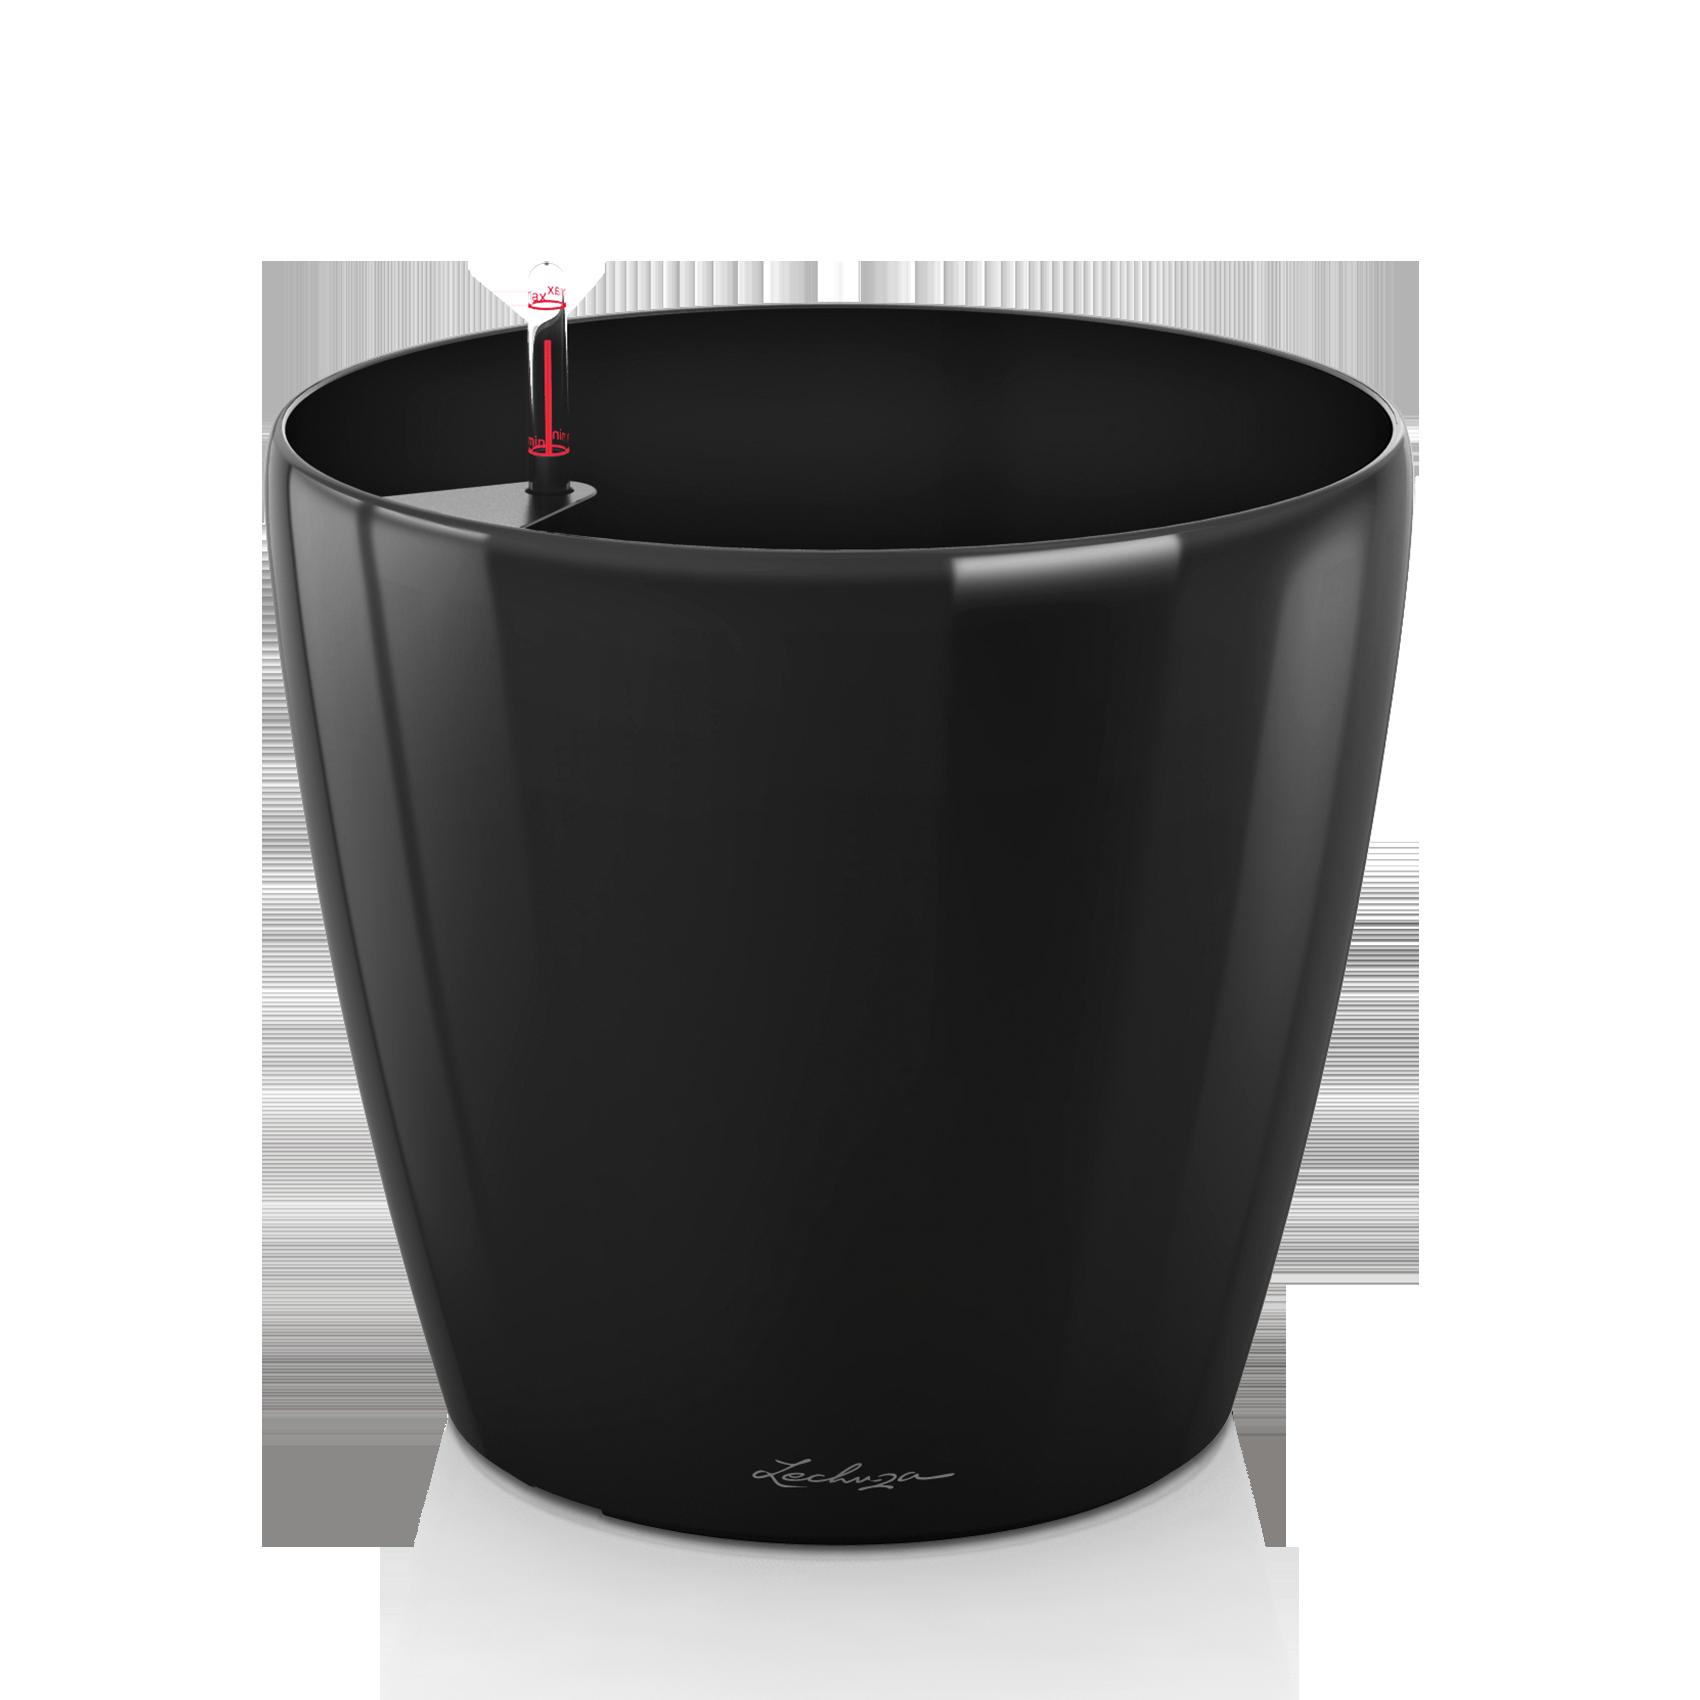 CLASSICO 70 black high-gloss